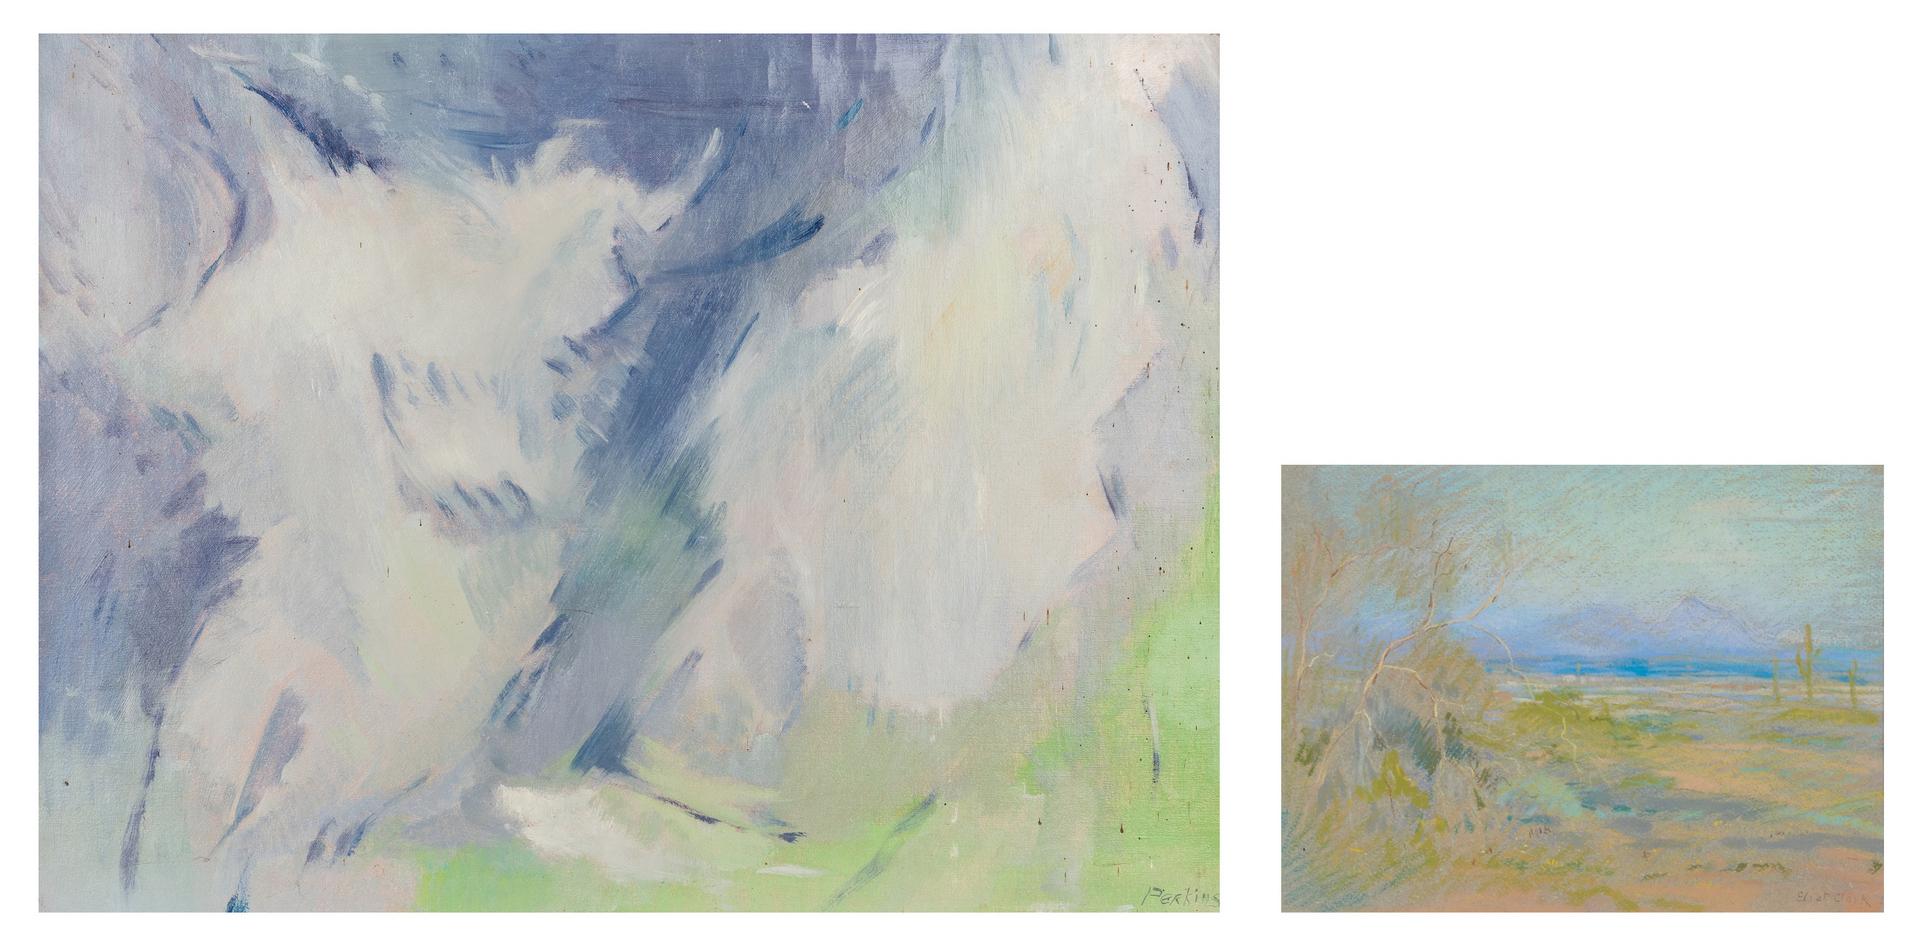 Lot 284: 2 American Artworks, incl. Philip Perkins, Eliot Clark